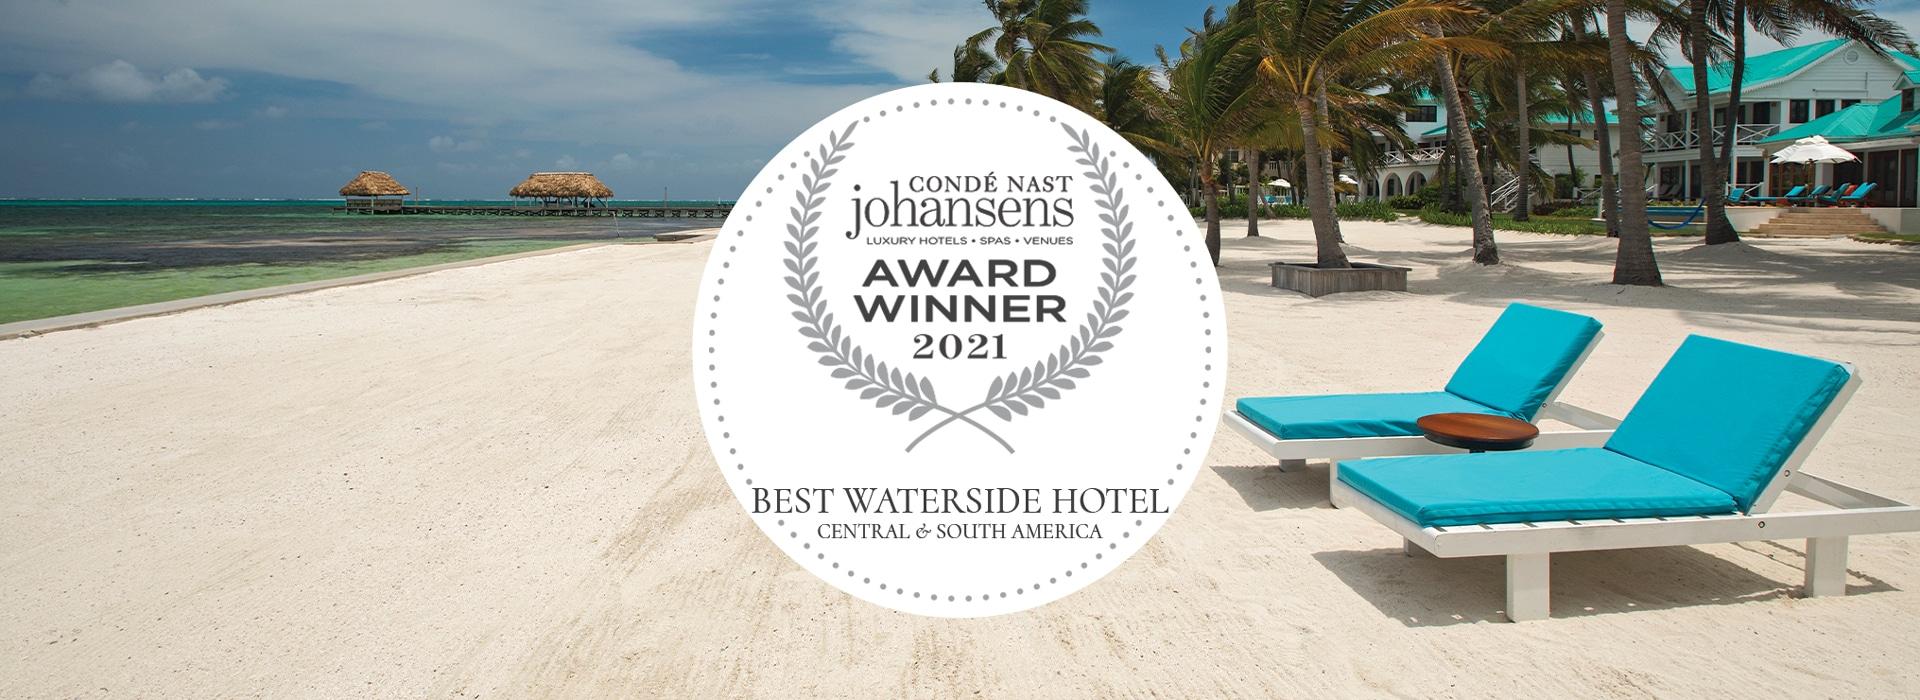 2020 Award Winnerl at Victoria House Resort & Spa, Belize